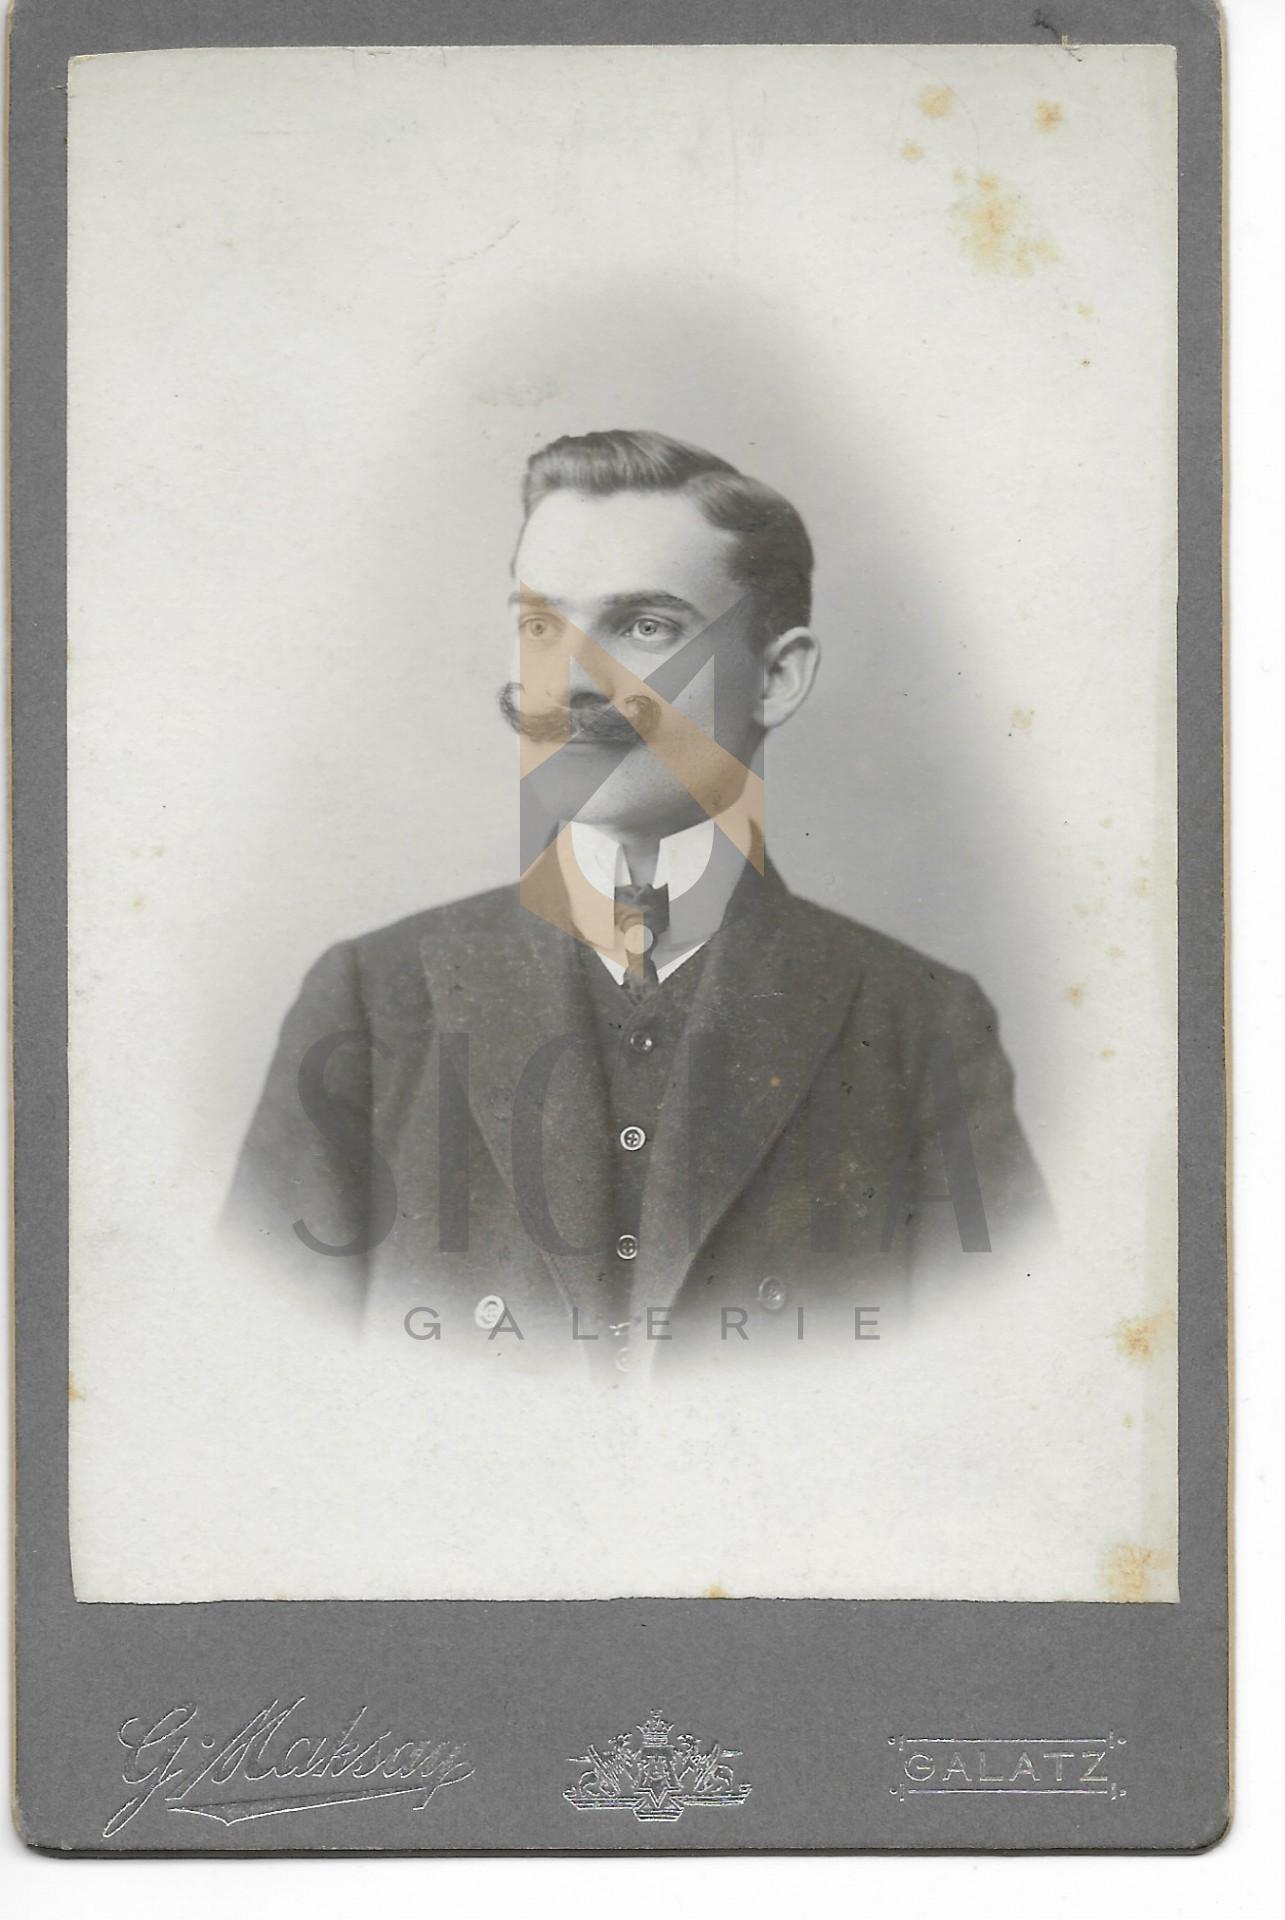 FOTO CABINET, GALATZ ( GALATI , ATELIER MAKSAY